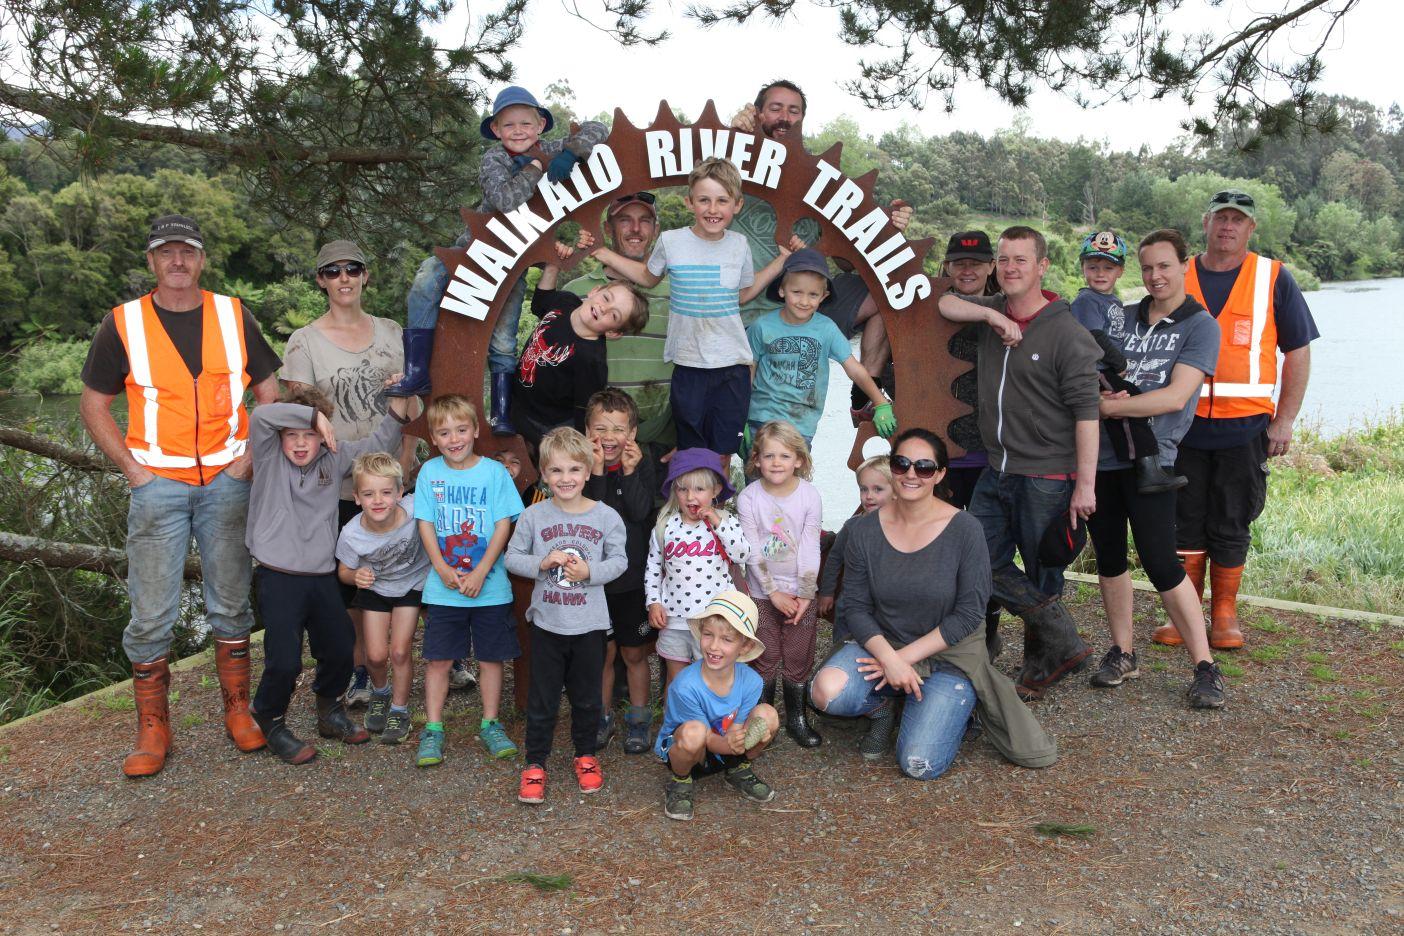 Act-of-Kindness-Volunteer-Waikato-River-Trails-Hero-IMG_0621.JPG